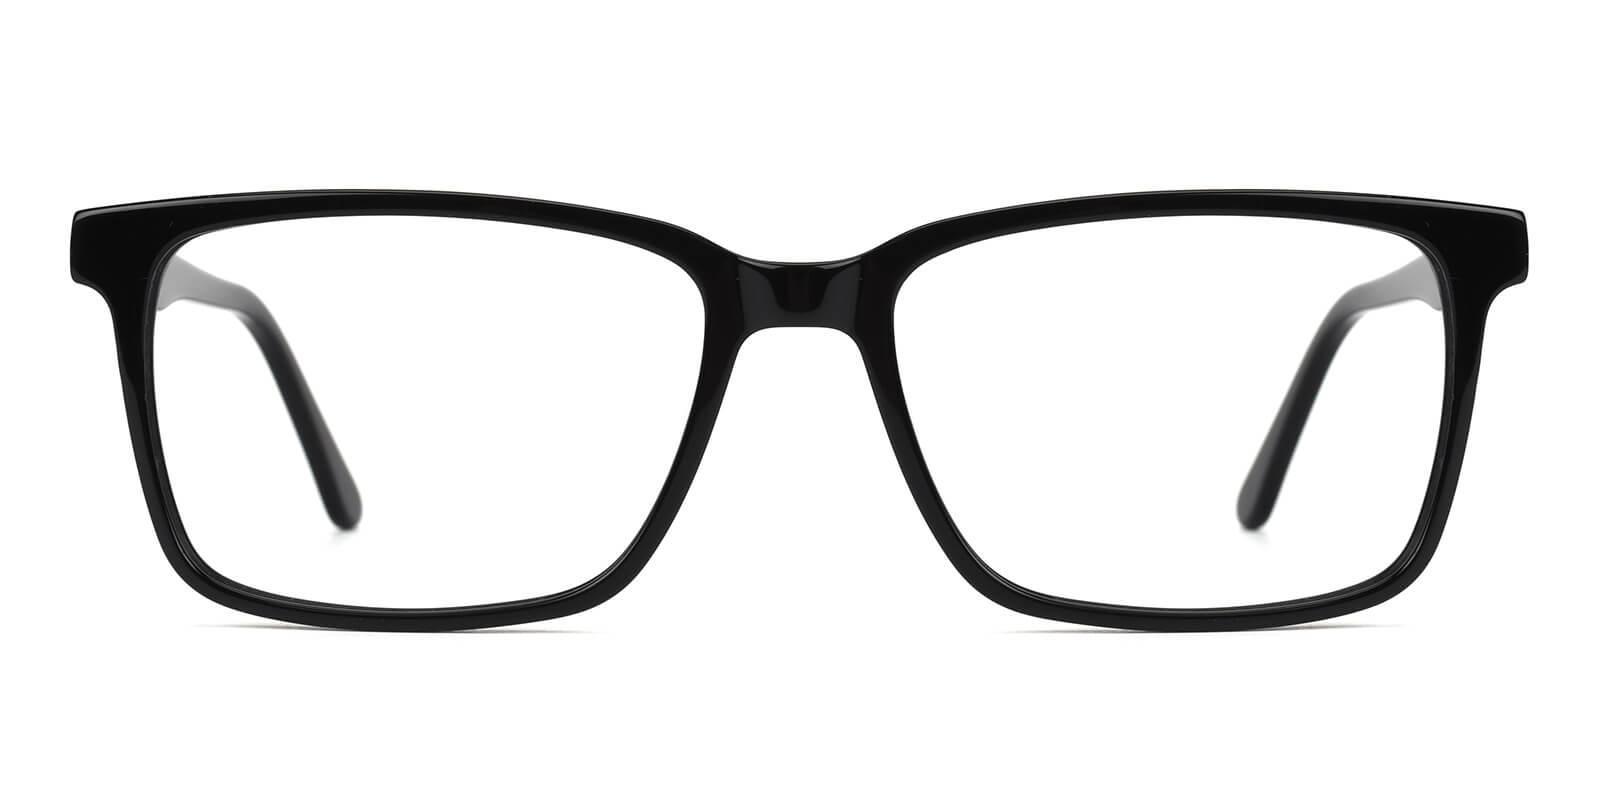 Sakou-Black-Square-Acetate-Eyeglasses-additional2